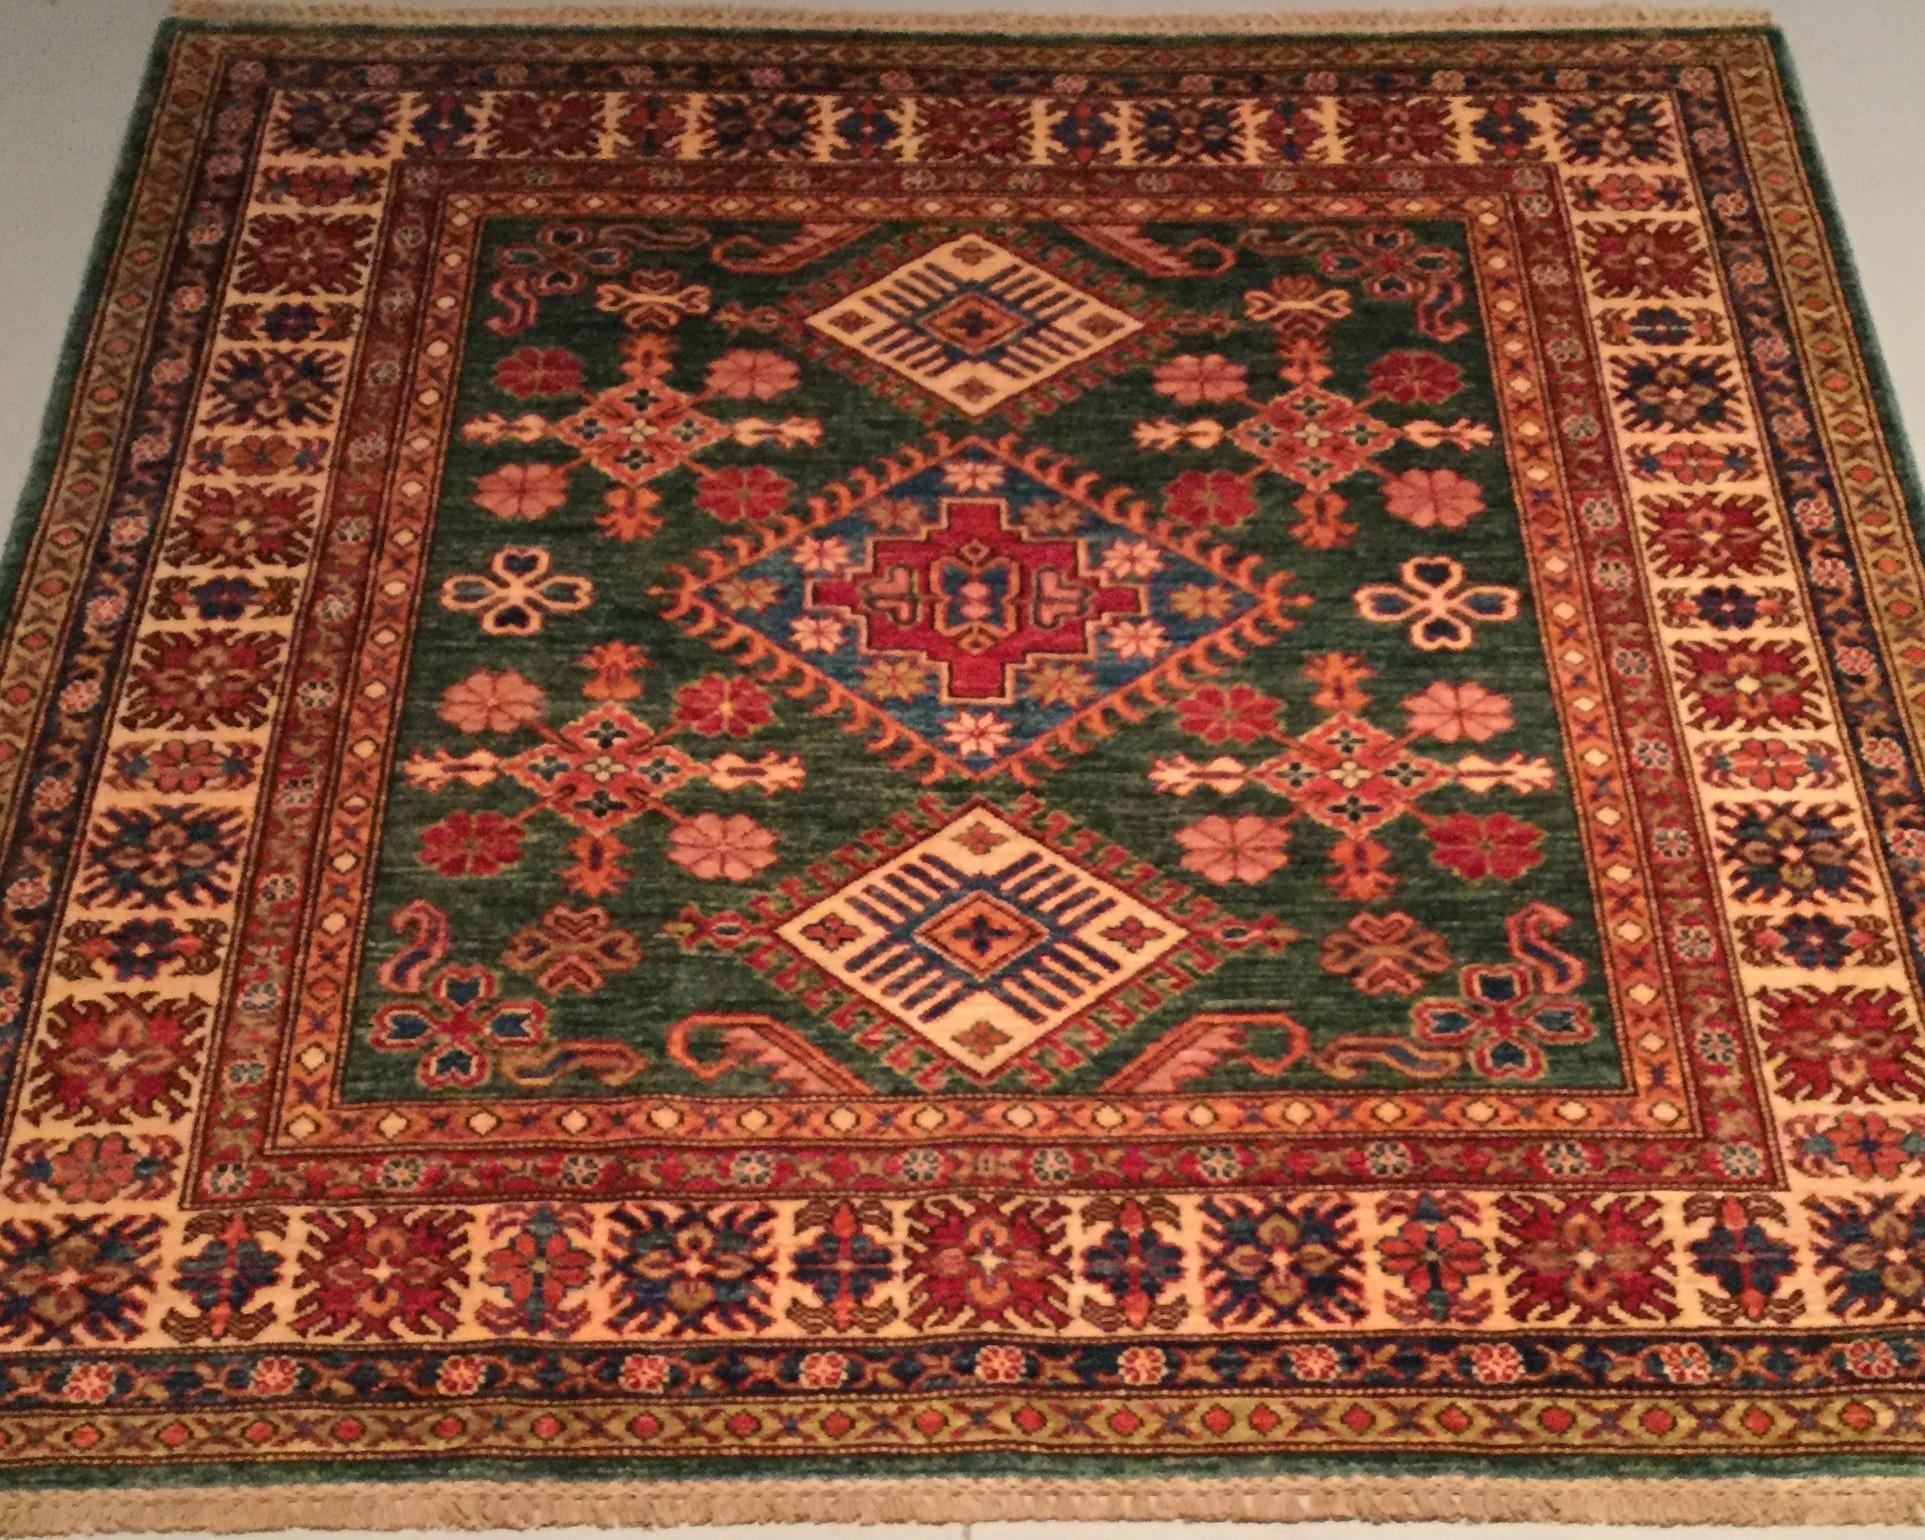 Afghan Kazak - Circa 2000'sSize Measurements: 147cm x 148cm